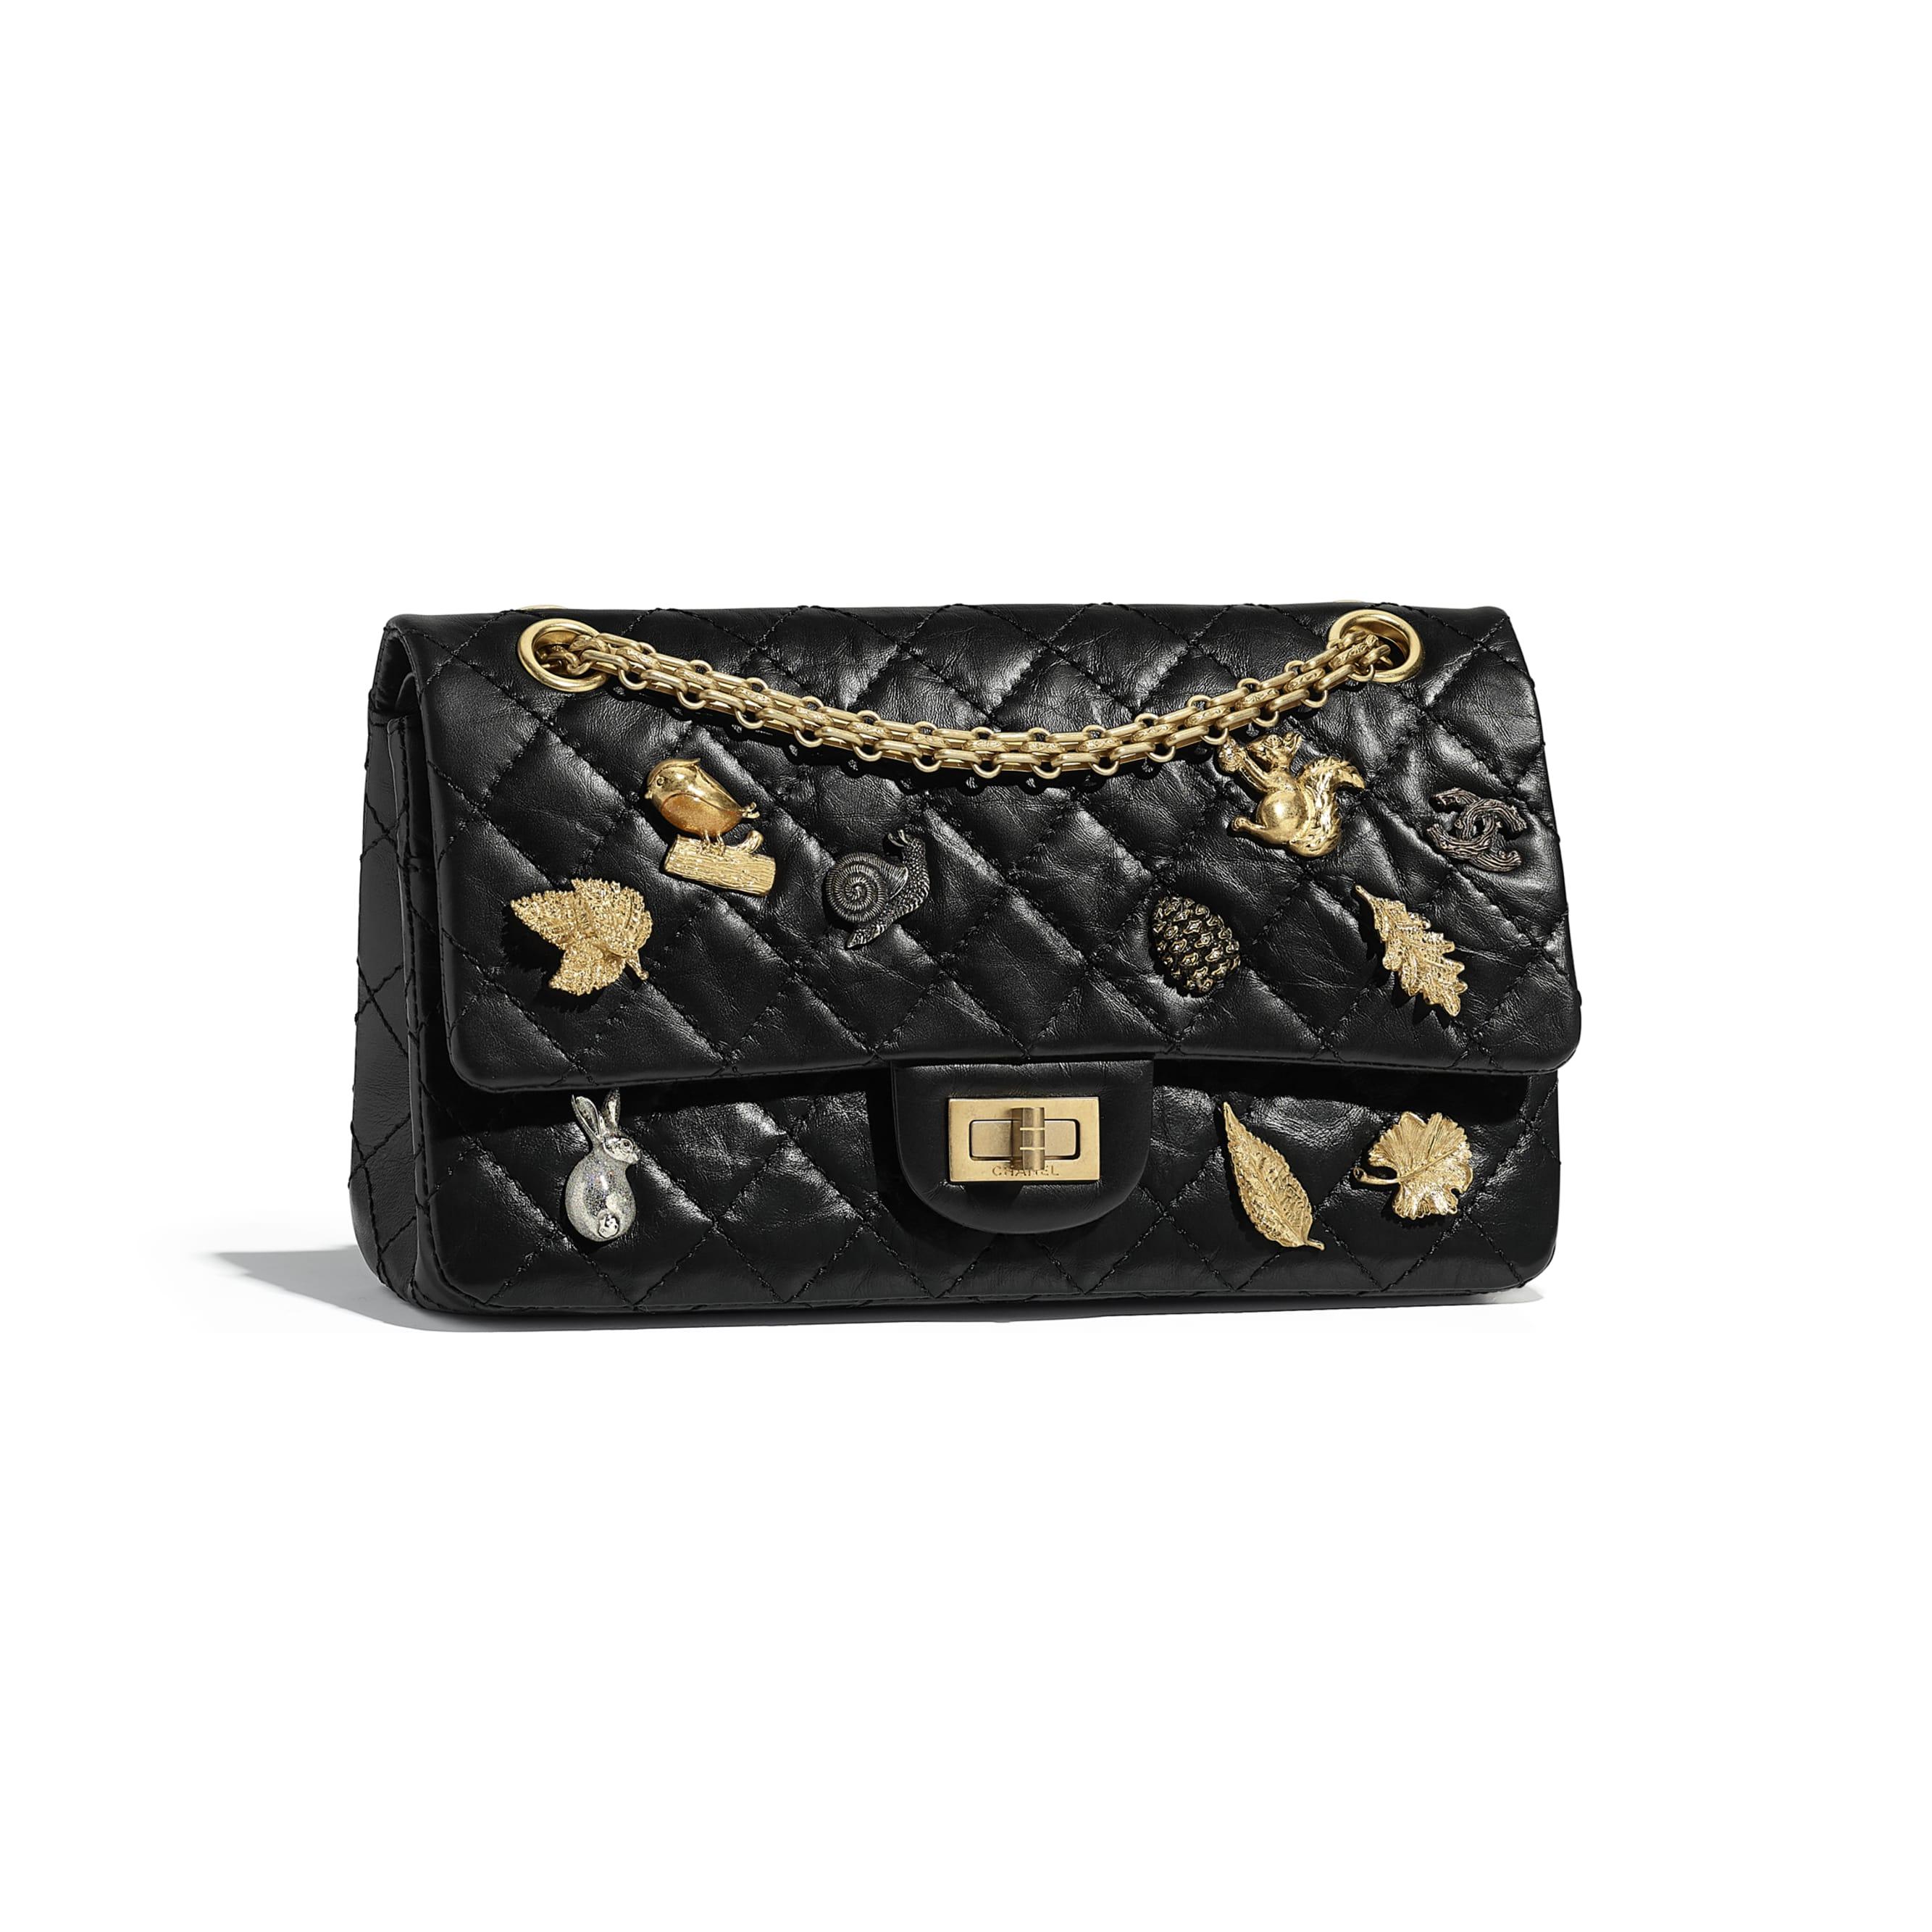 2.55 Handbag - Black - Aged Calfskin, Charms & Gold-Tone Metal - Default view - see standard sized version